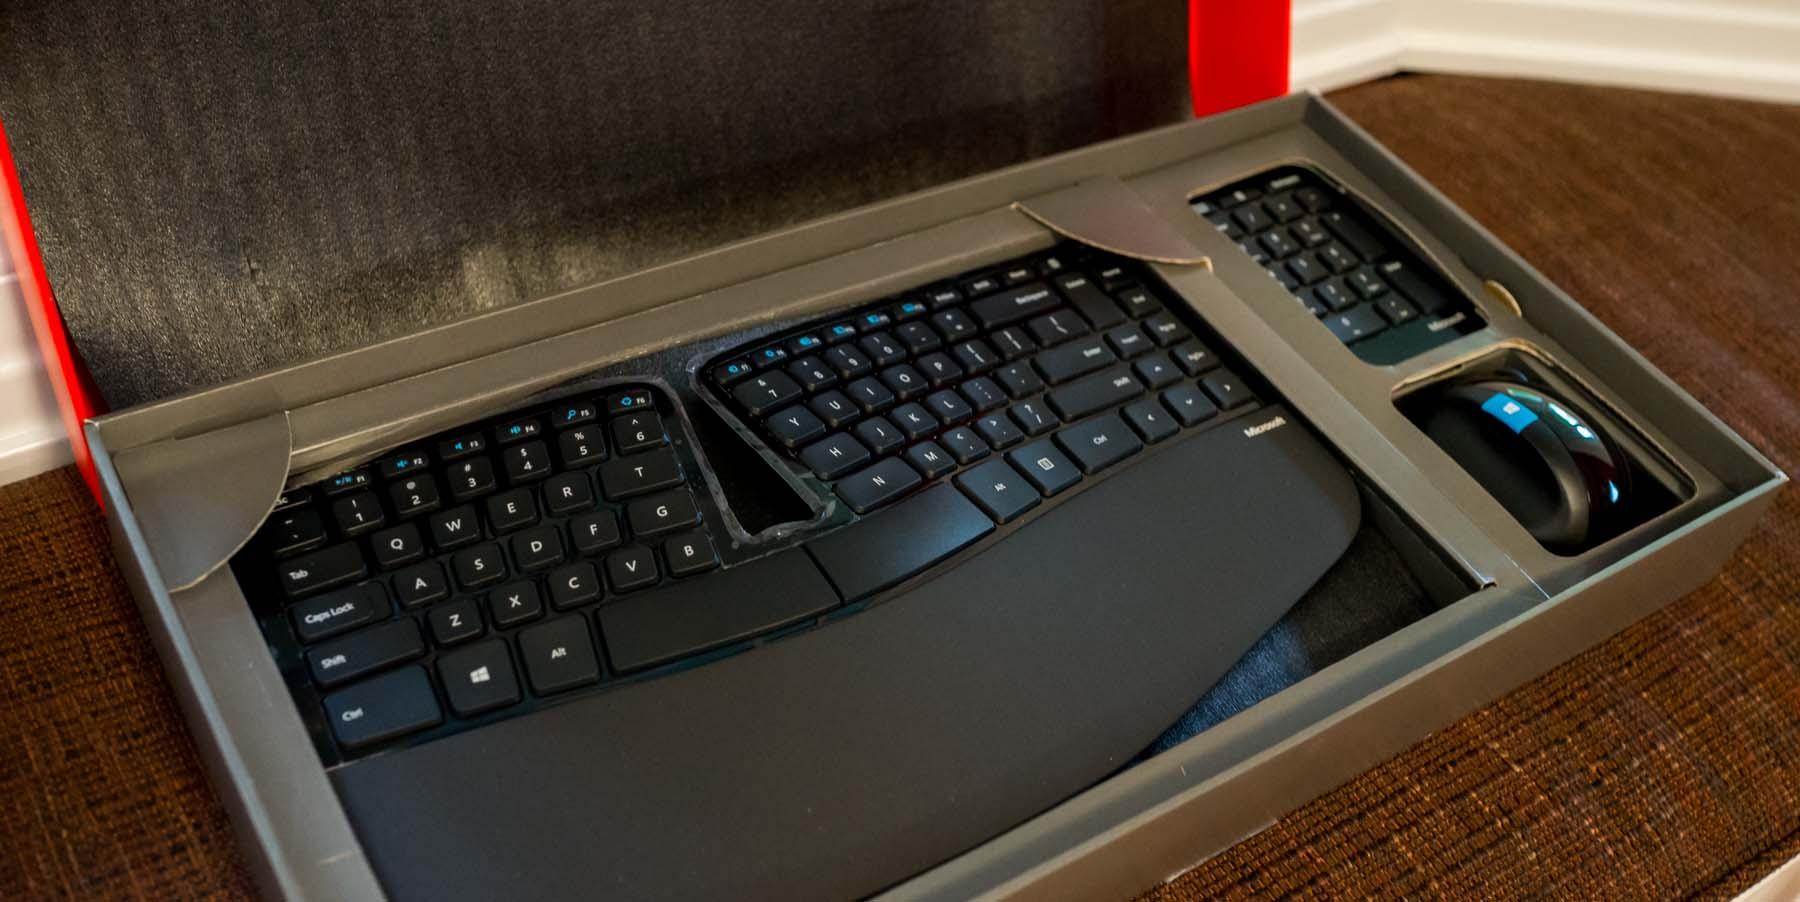 Microsoft's Sculpt Ergonomic Keyboard – Marco org